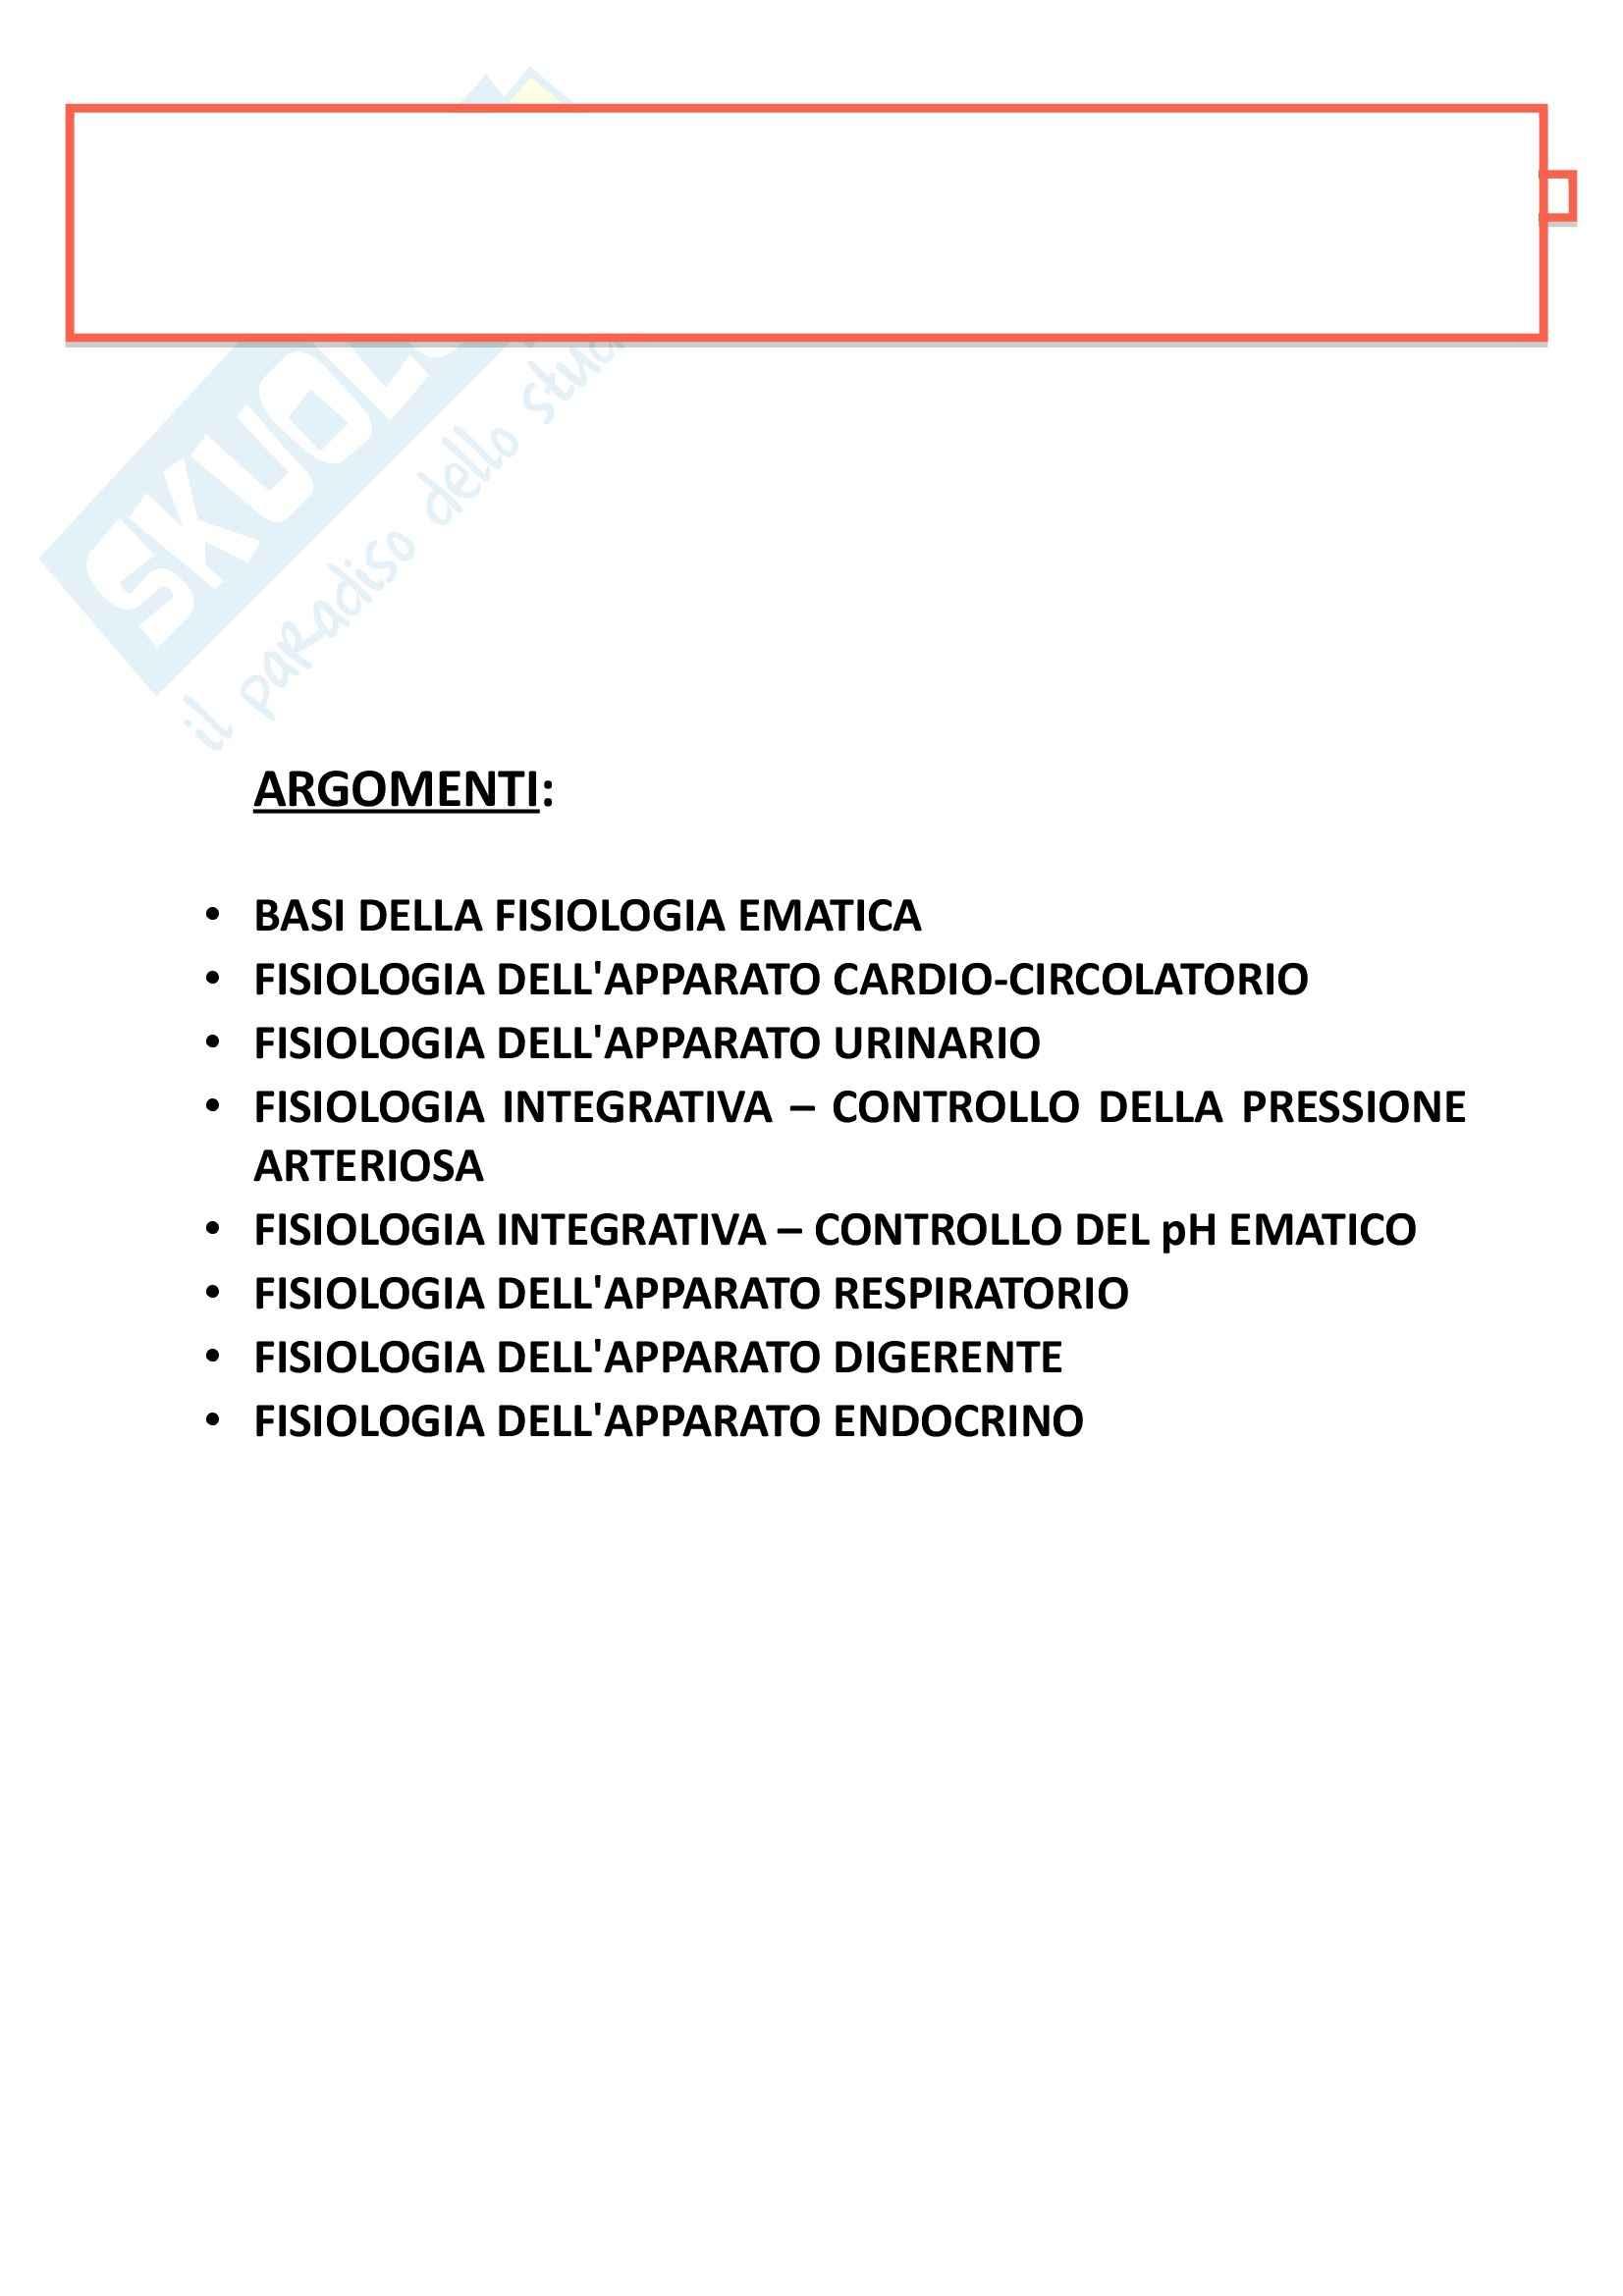 appunto C. Grassi Fisiologia